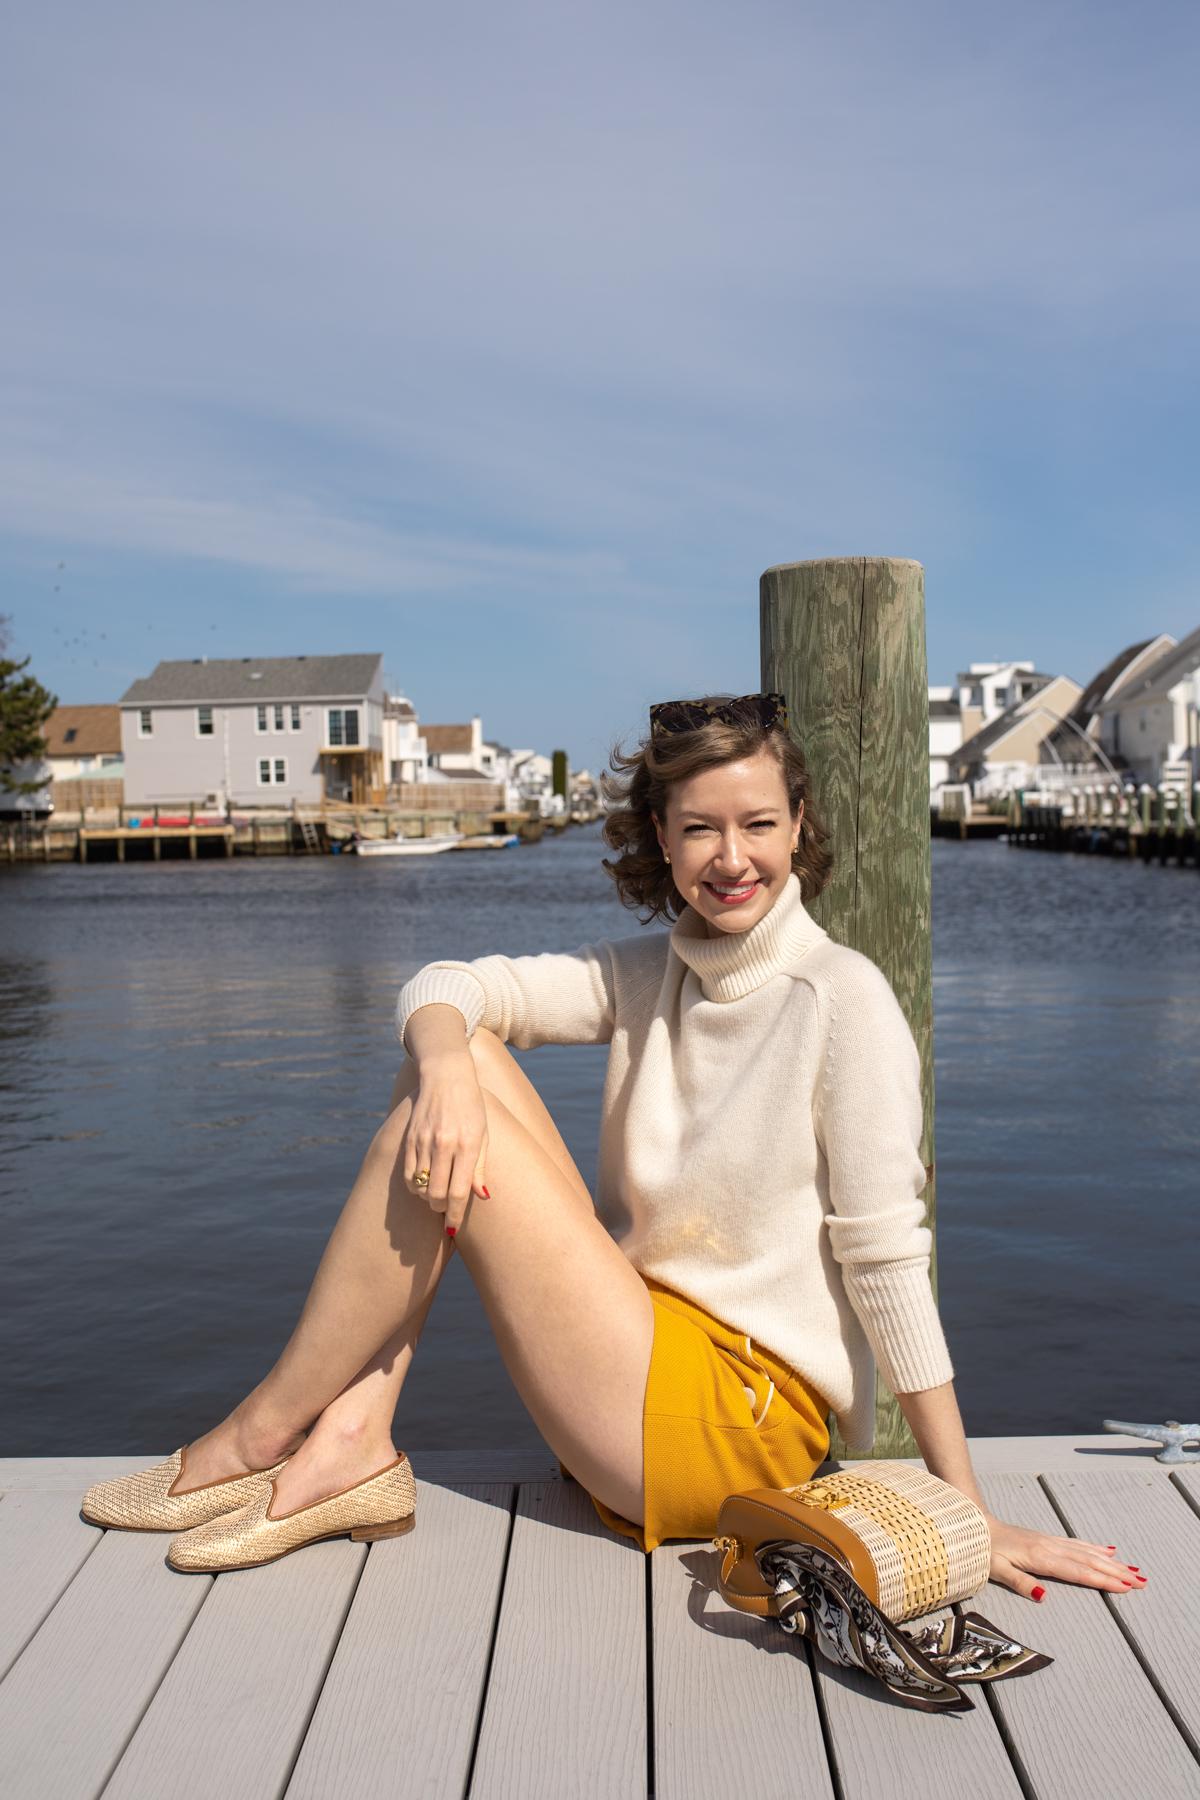 Stacie Flinner X J.Crew Sailor Shorts-11.jpg